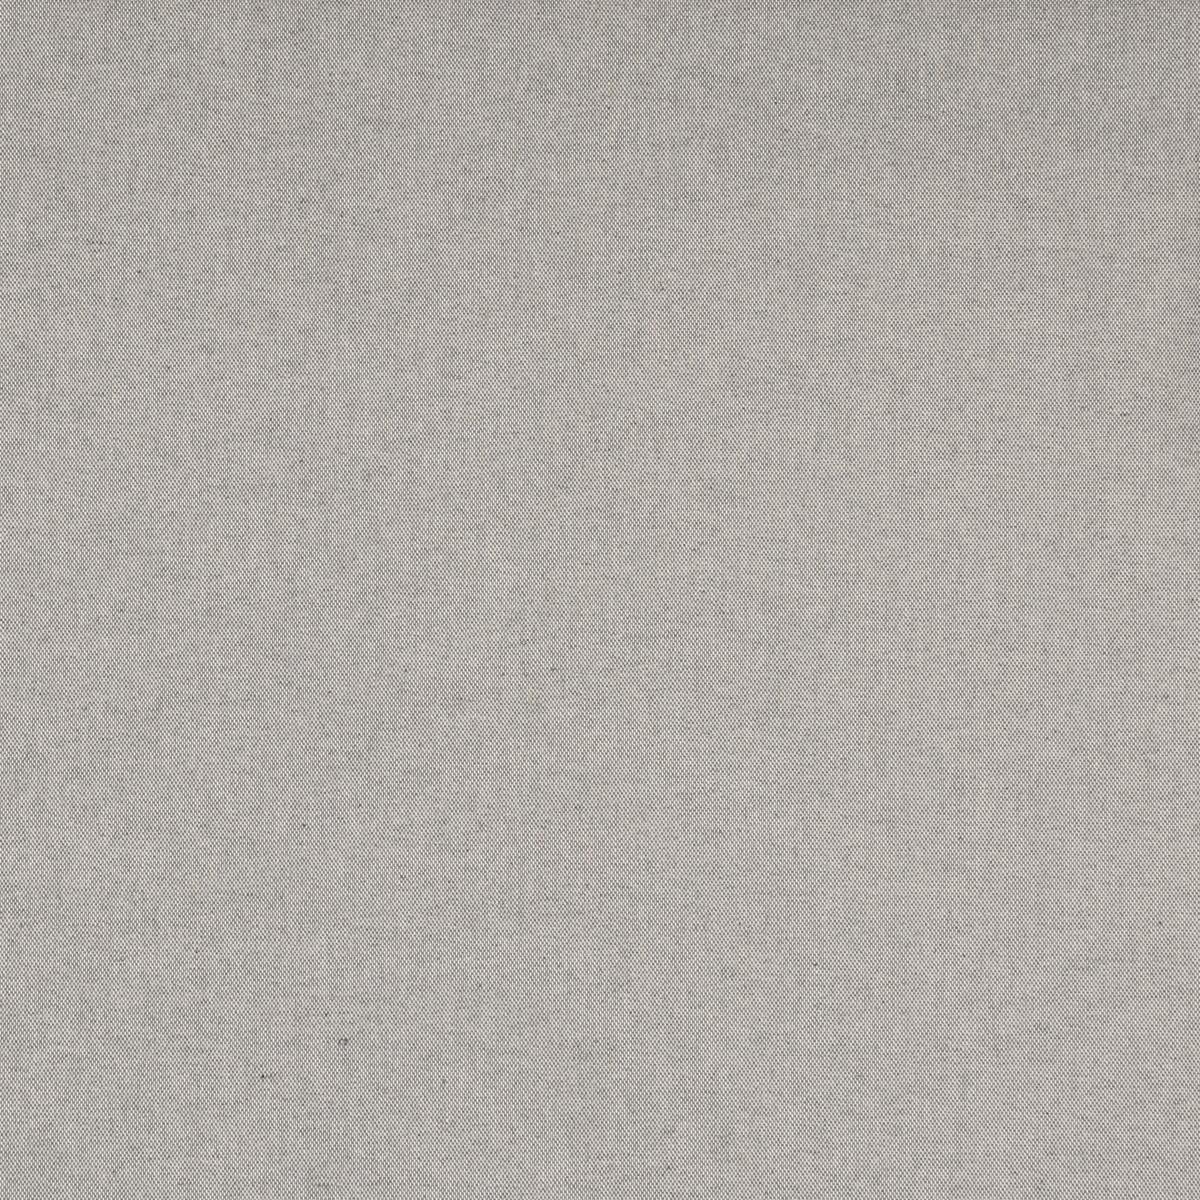 Dekostoff Dobby Panama Leinenlook meliert uni grau 1,40m Breite